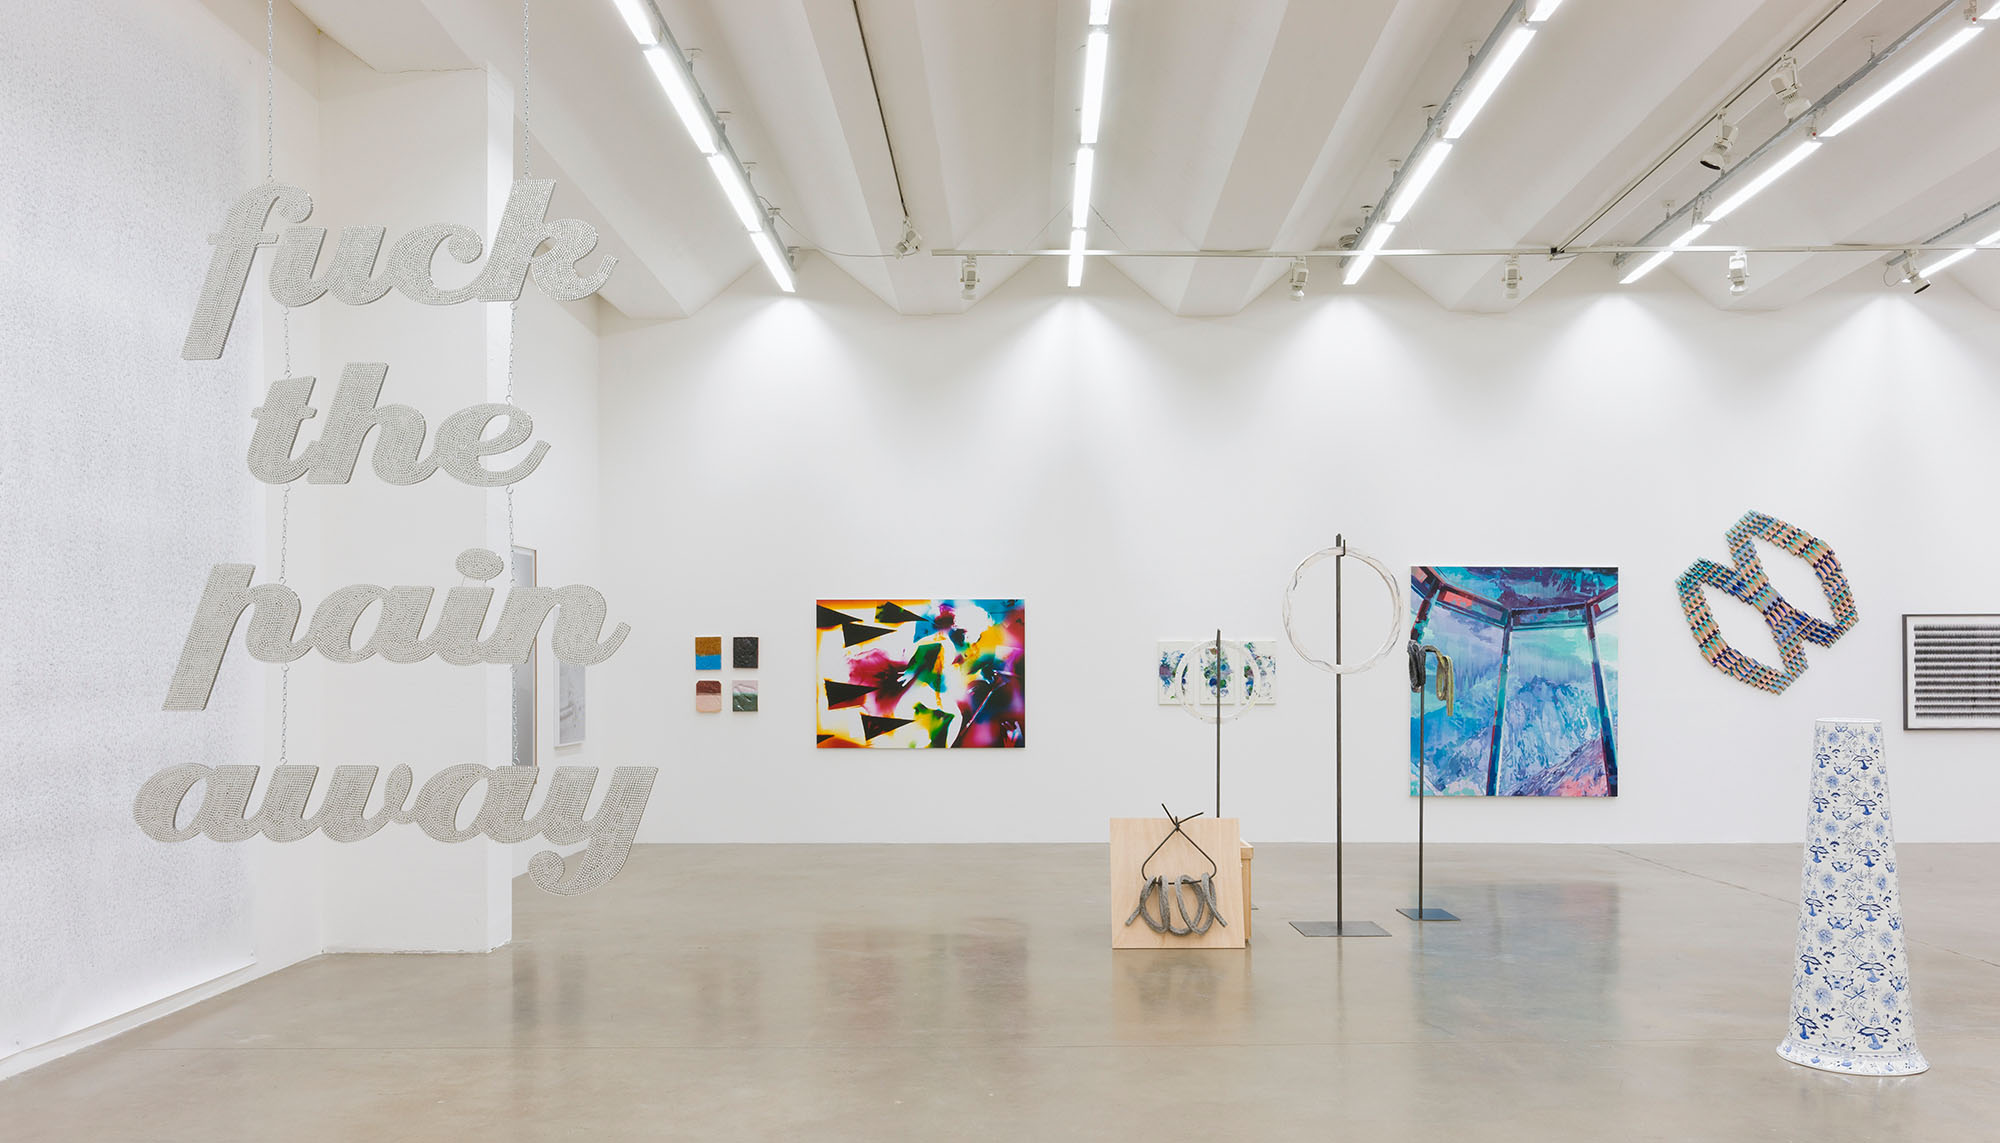 Ausstellung Saloon, Sexauer Gallery, Katharina Arndt, fuck the pain away, 2015